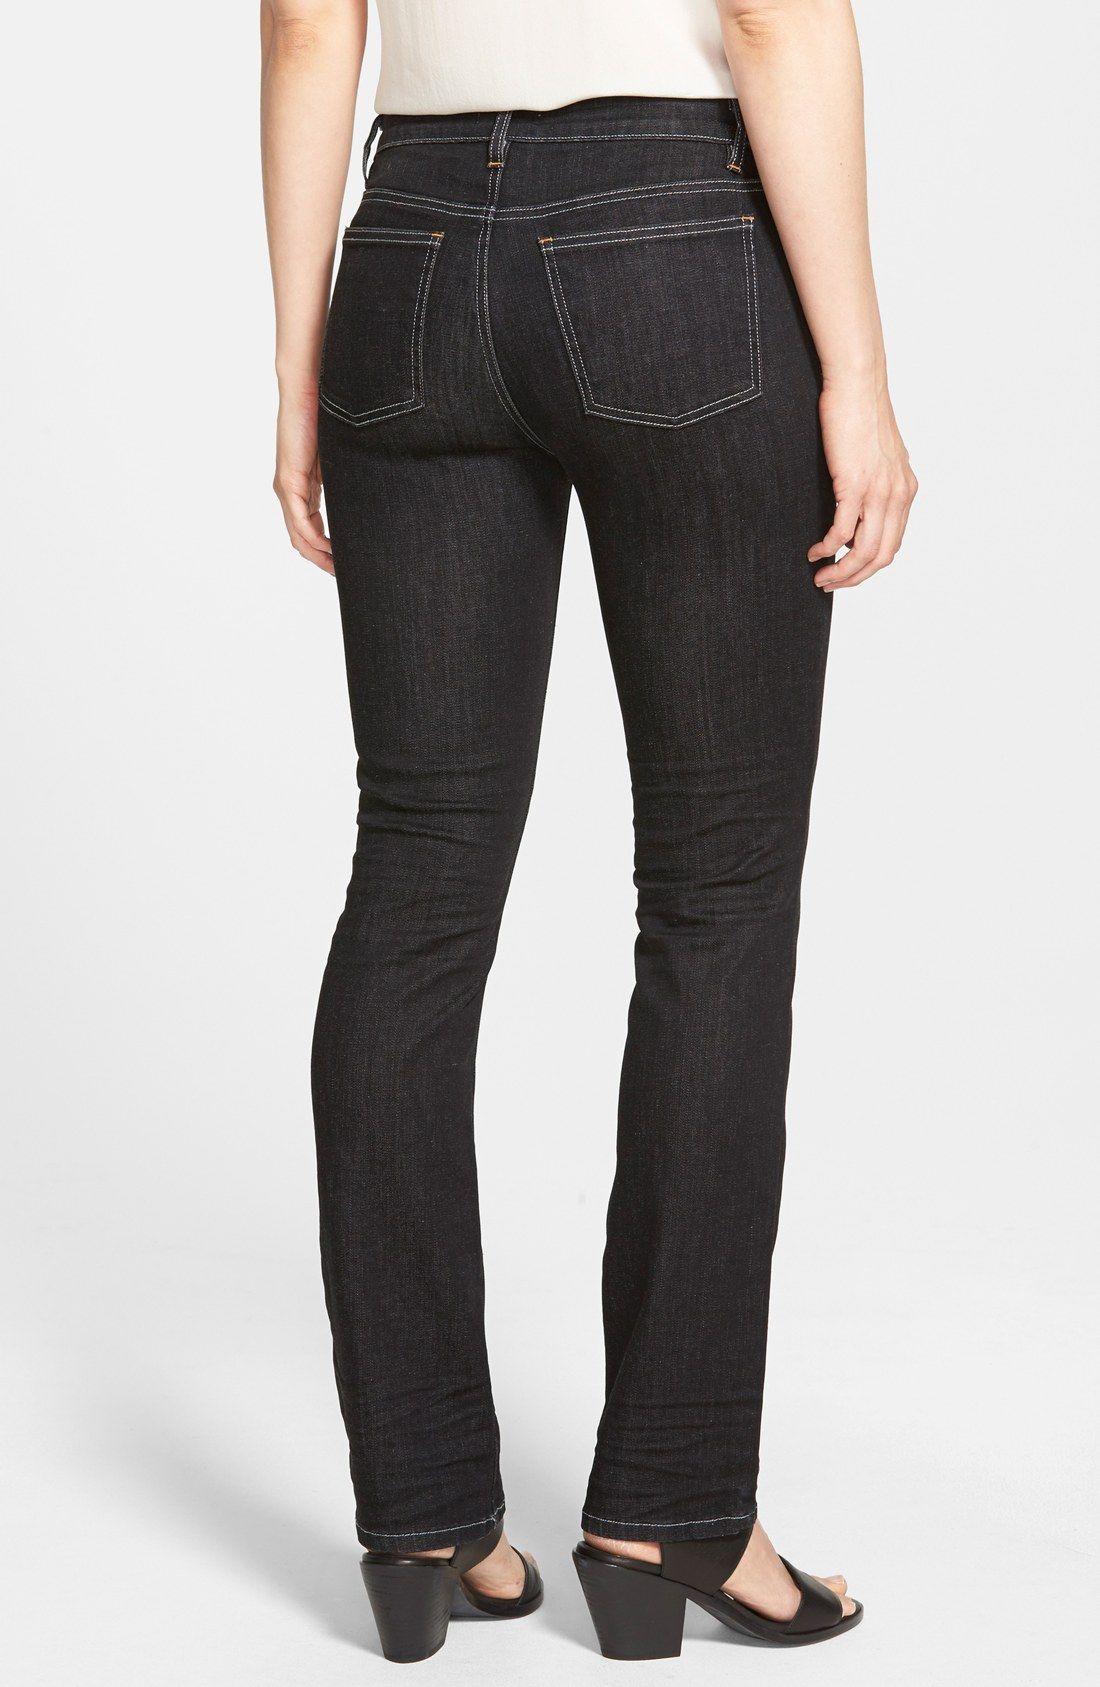 Eileen Fisher Straight Leg Stretch Jeans (Regular & Petite)